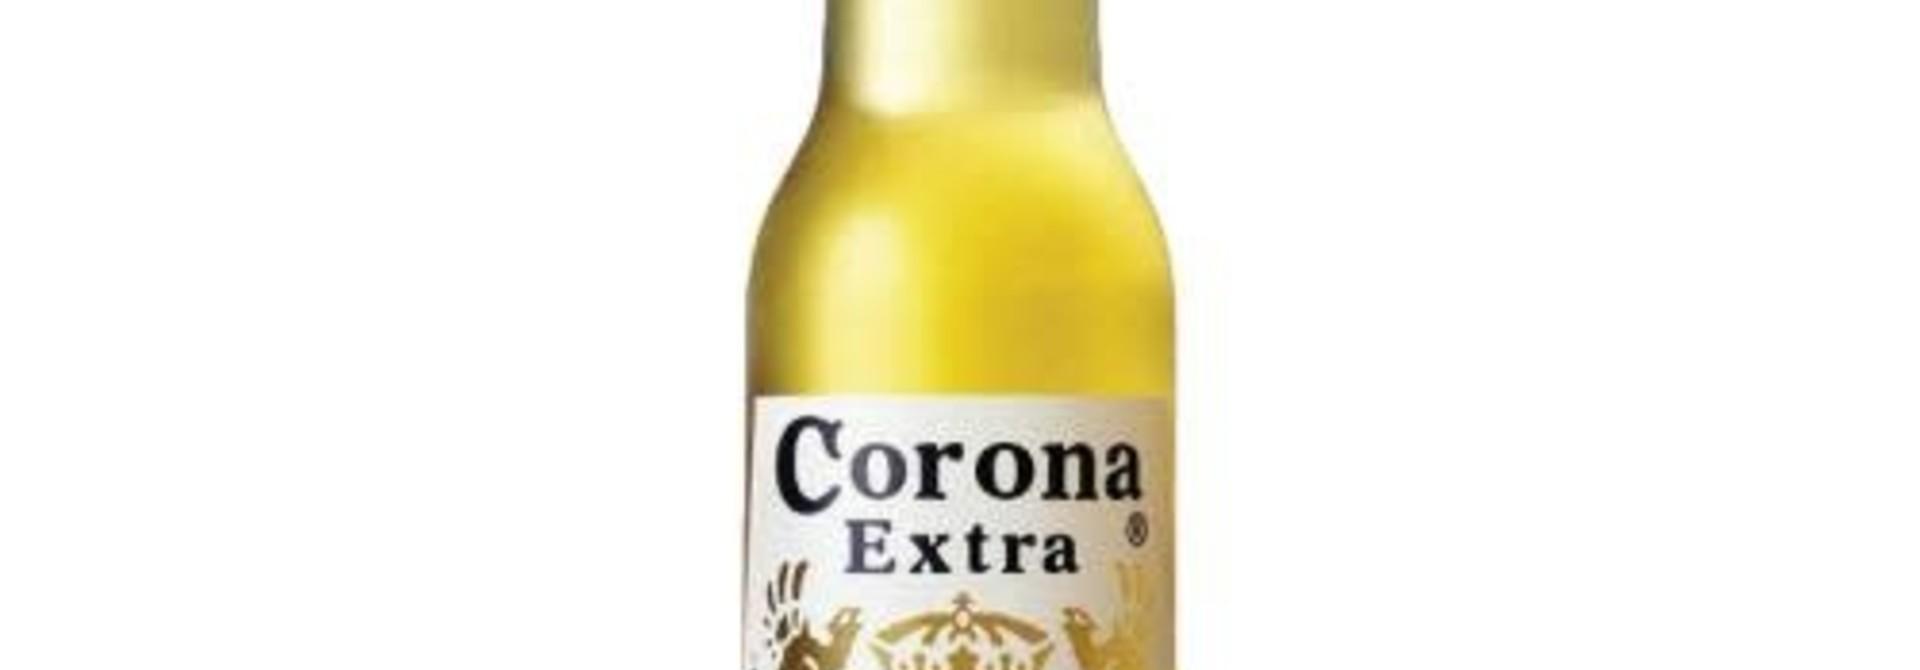 CORONA O.W. MEXICO